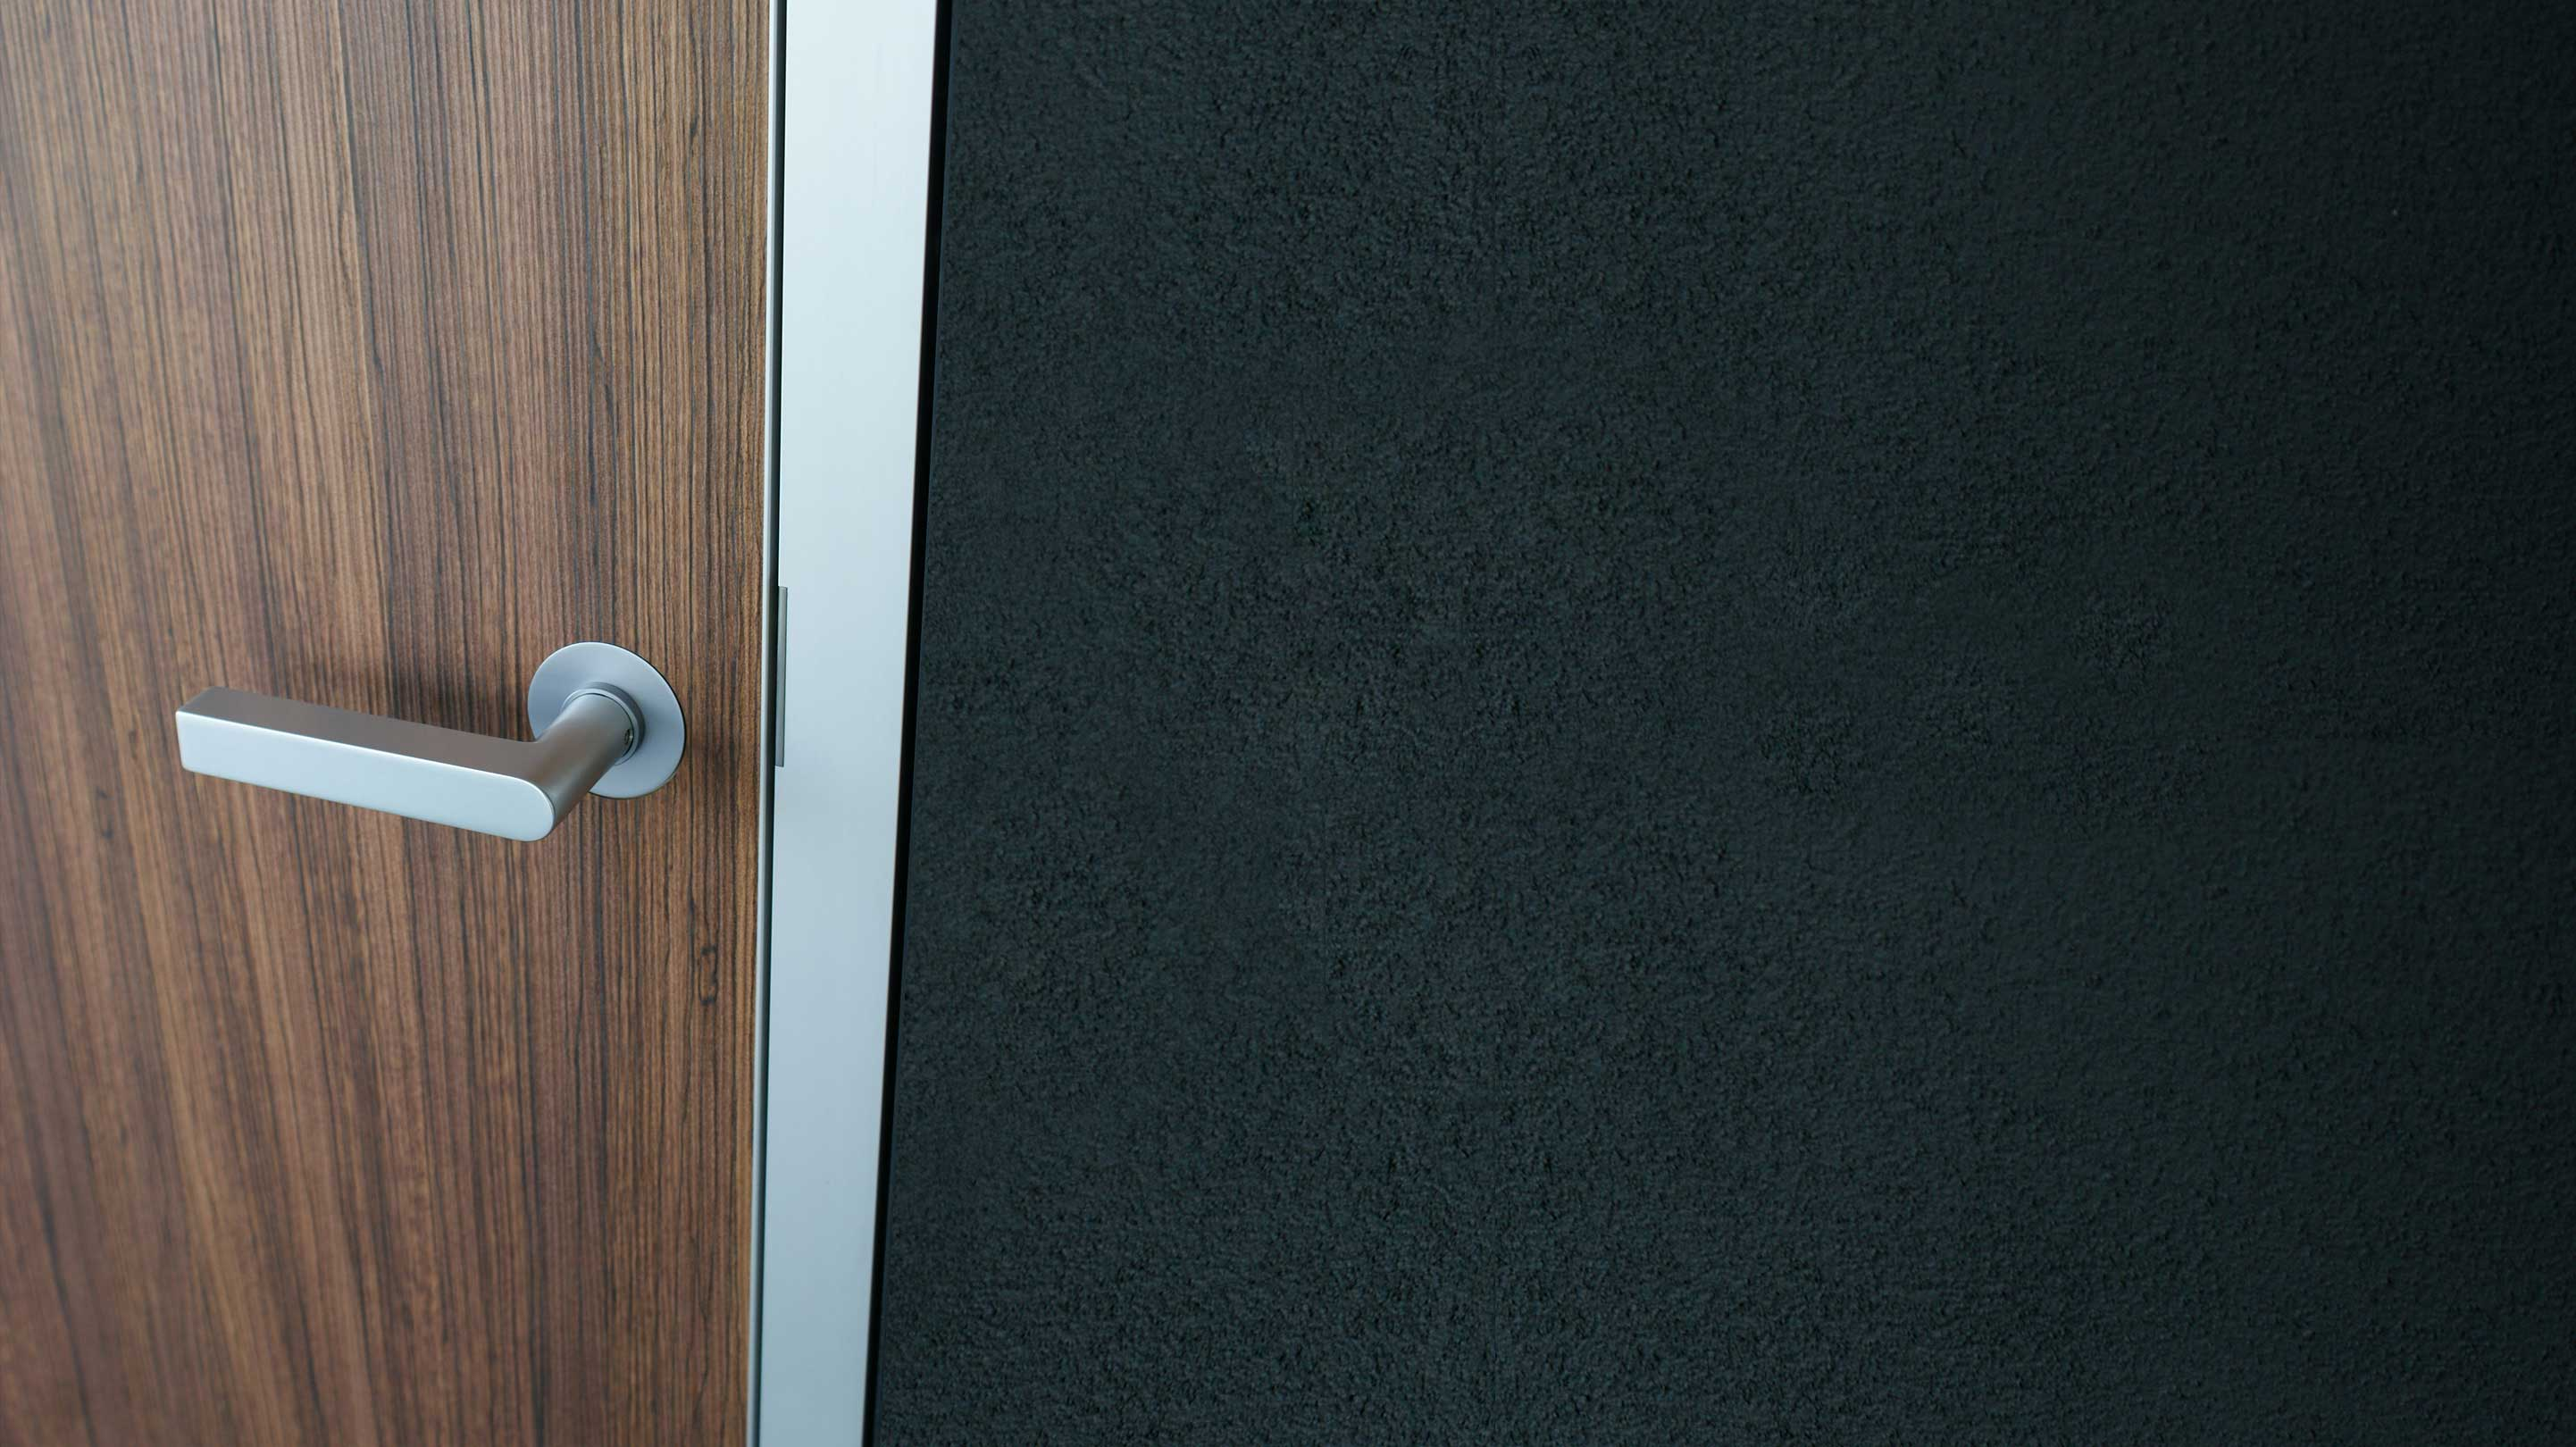 Türen Zargen Profile aus Aluminium - Küffner Aluzargen